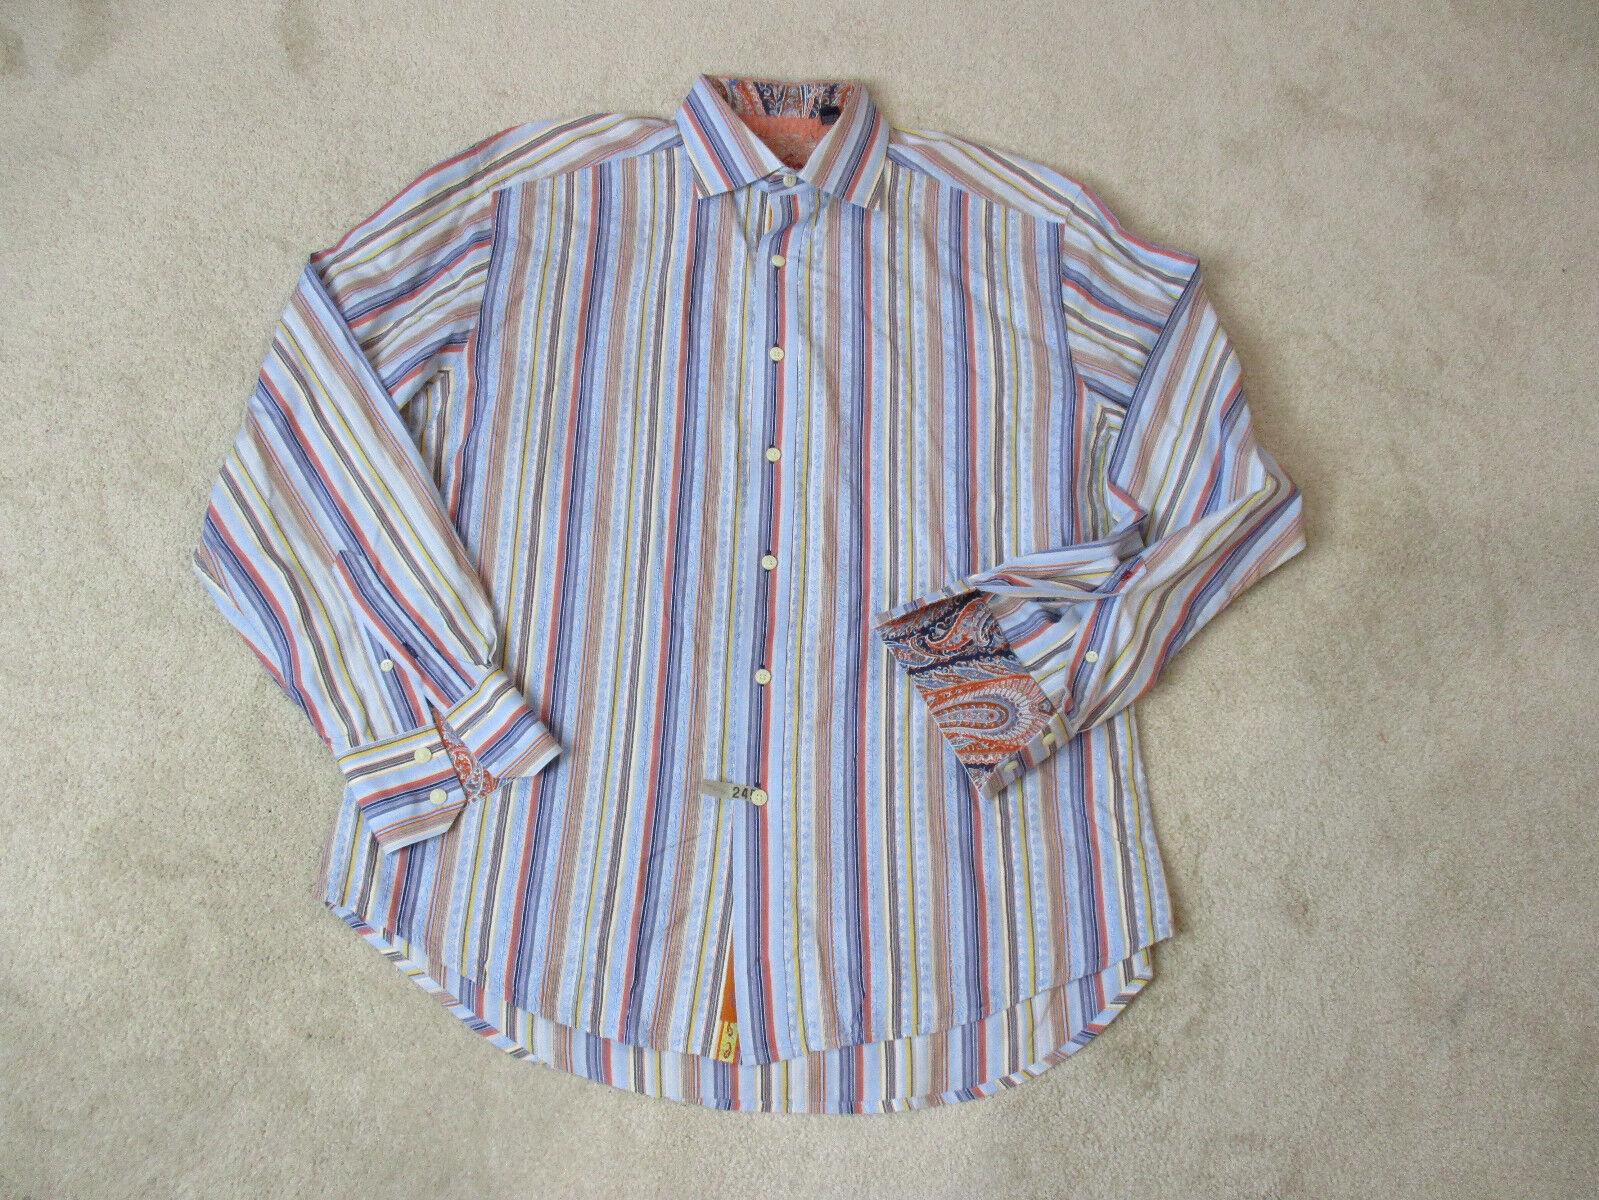 Robert Graham Flip Cuff Button Up Shirt Adult Extra Large bluee orange Casual Men